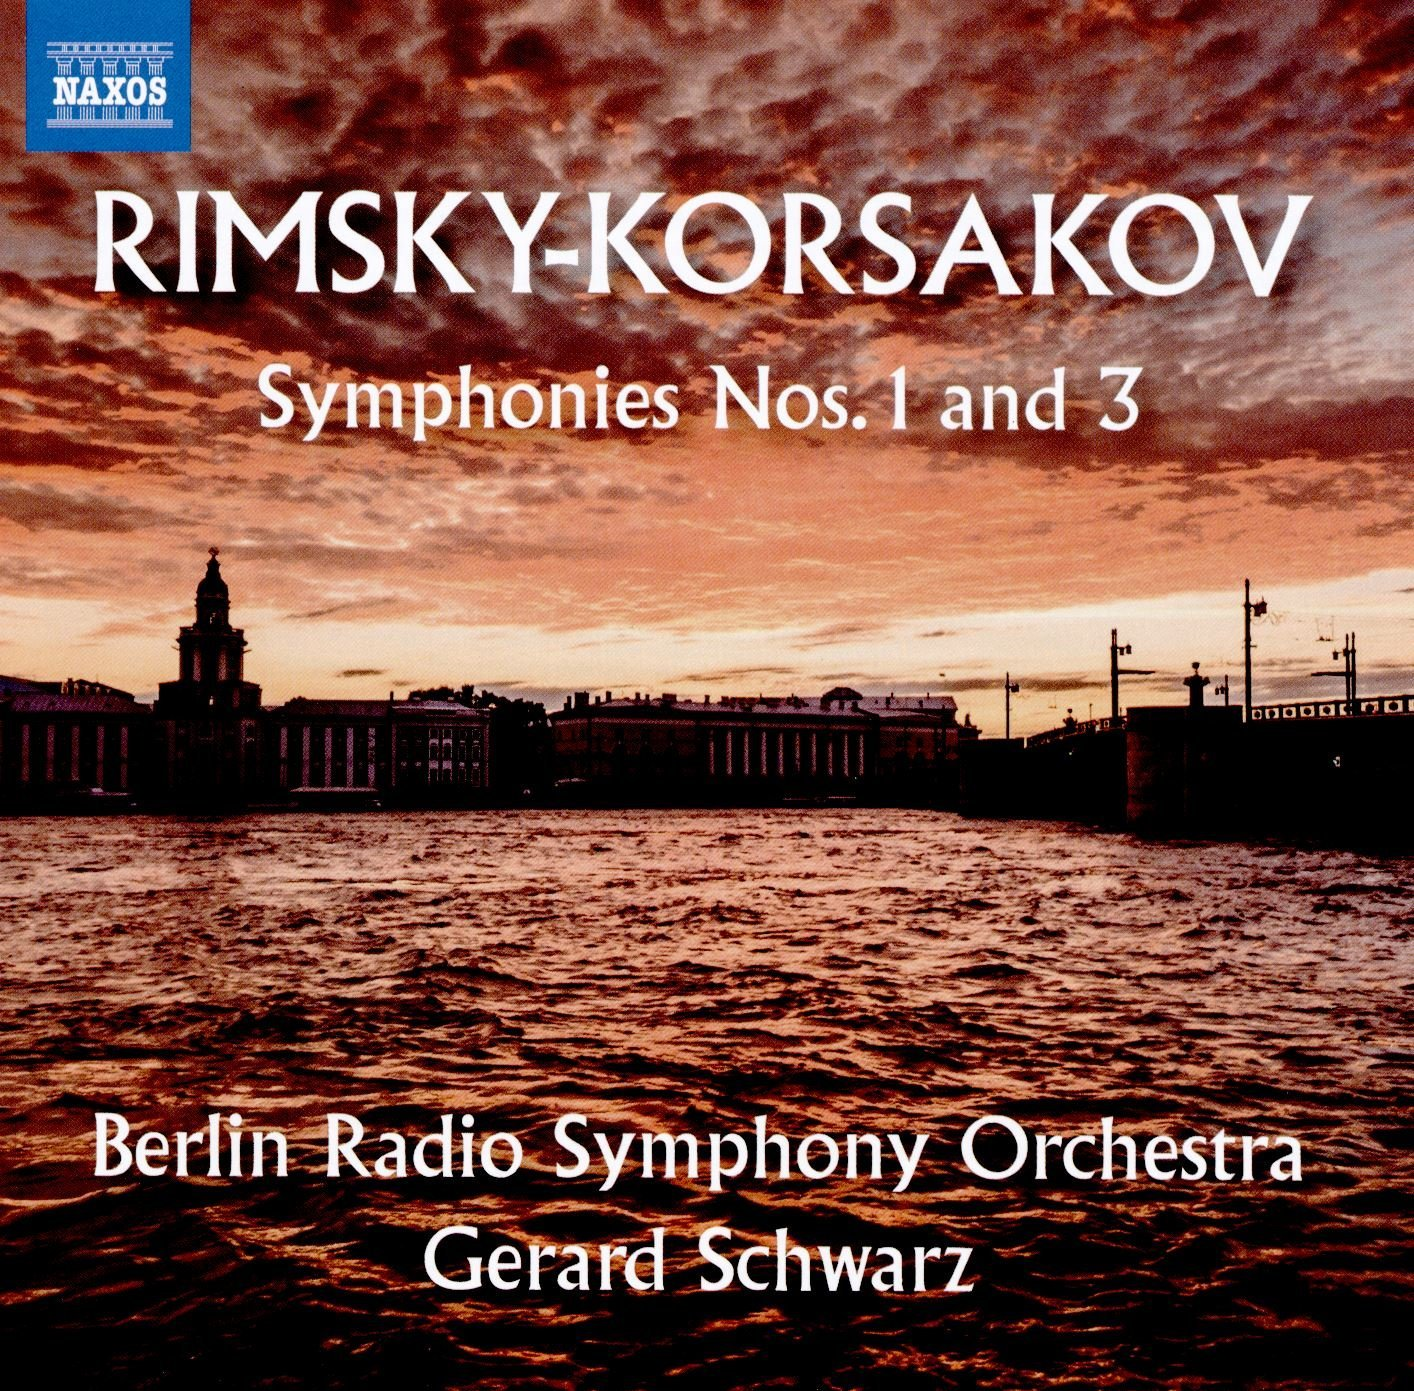 Rimsky-Korsakov Symphonies 1 & 3